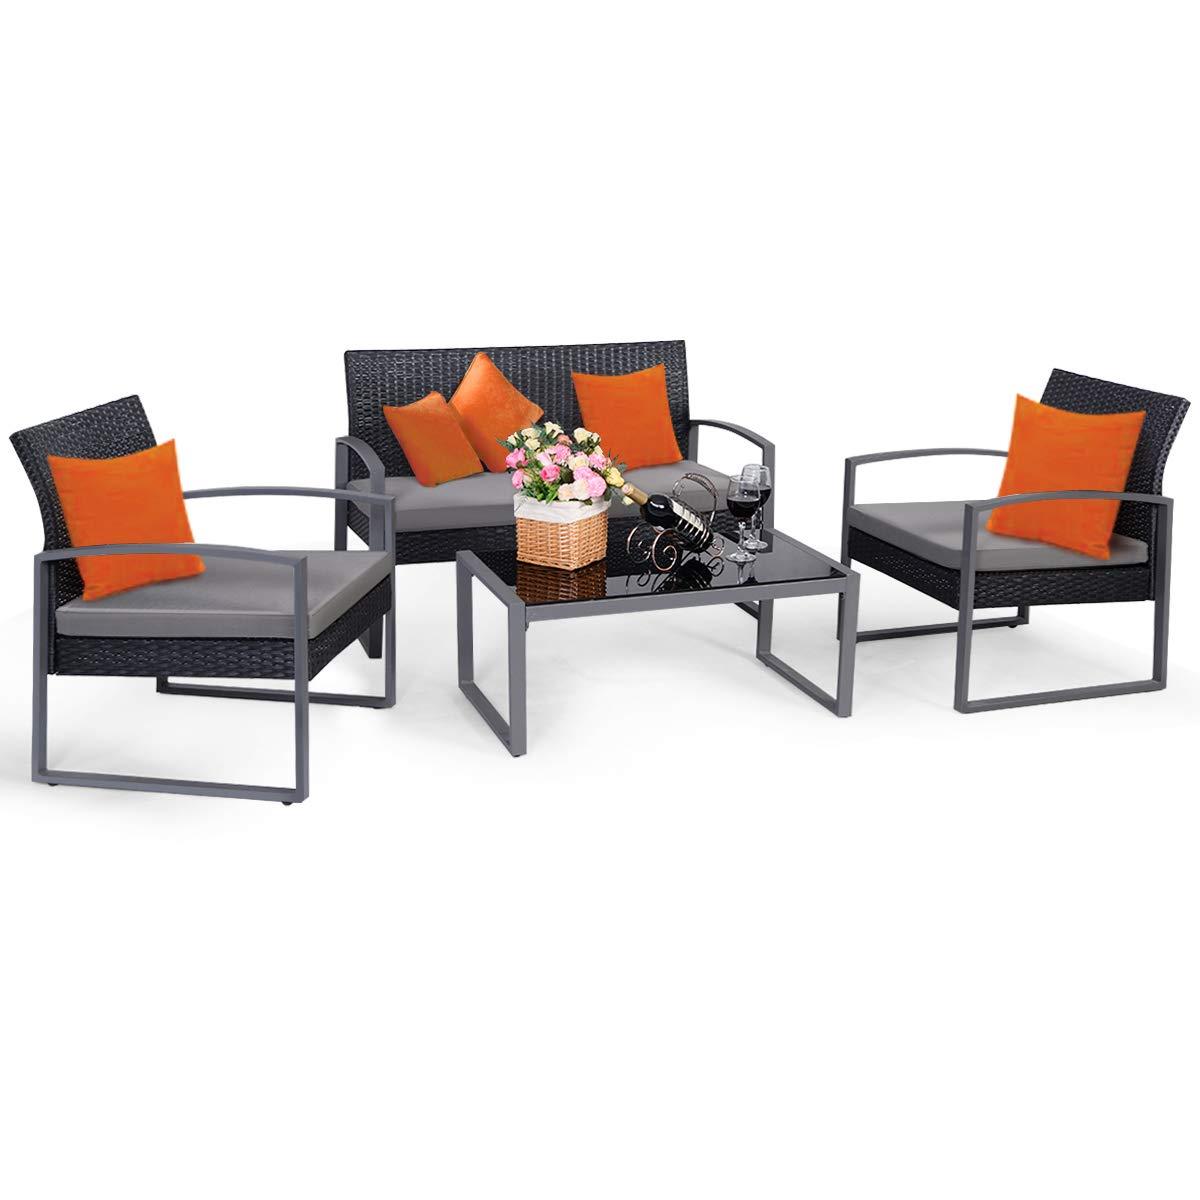 Tangkula 4 PCS Outdoor Patio Furniture Rattan Wicker Conversation Set, As pic by Tangkula